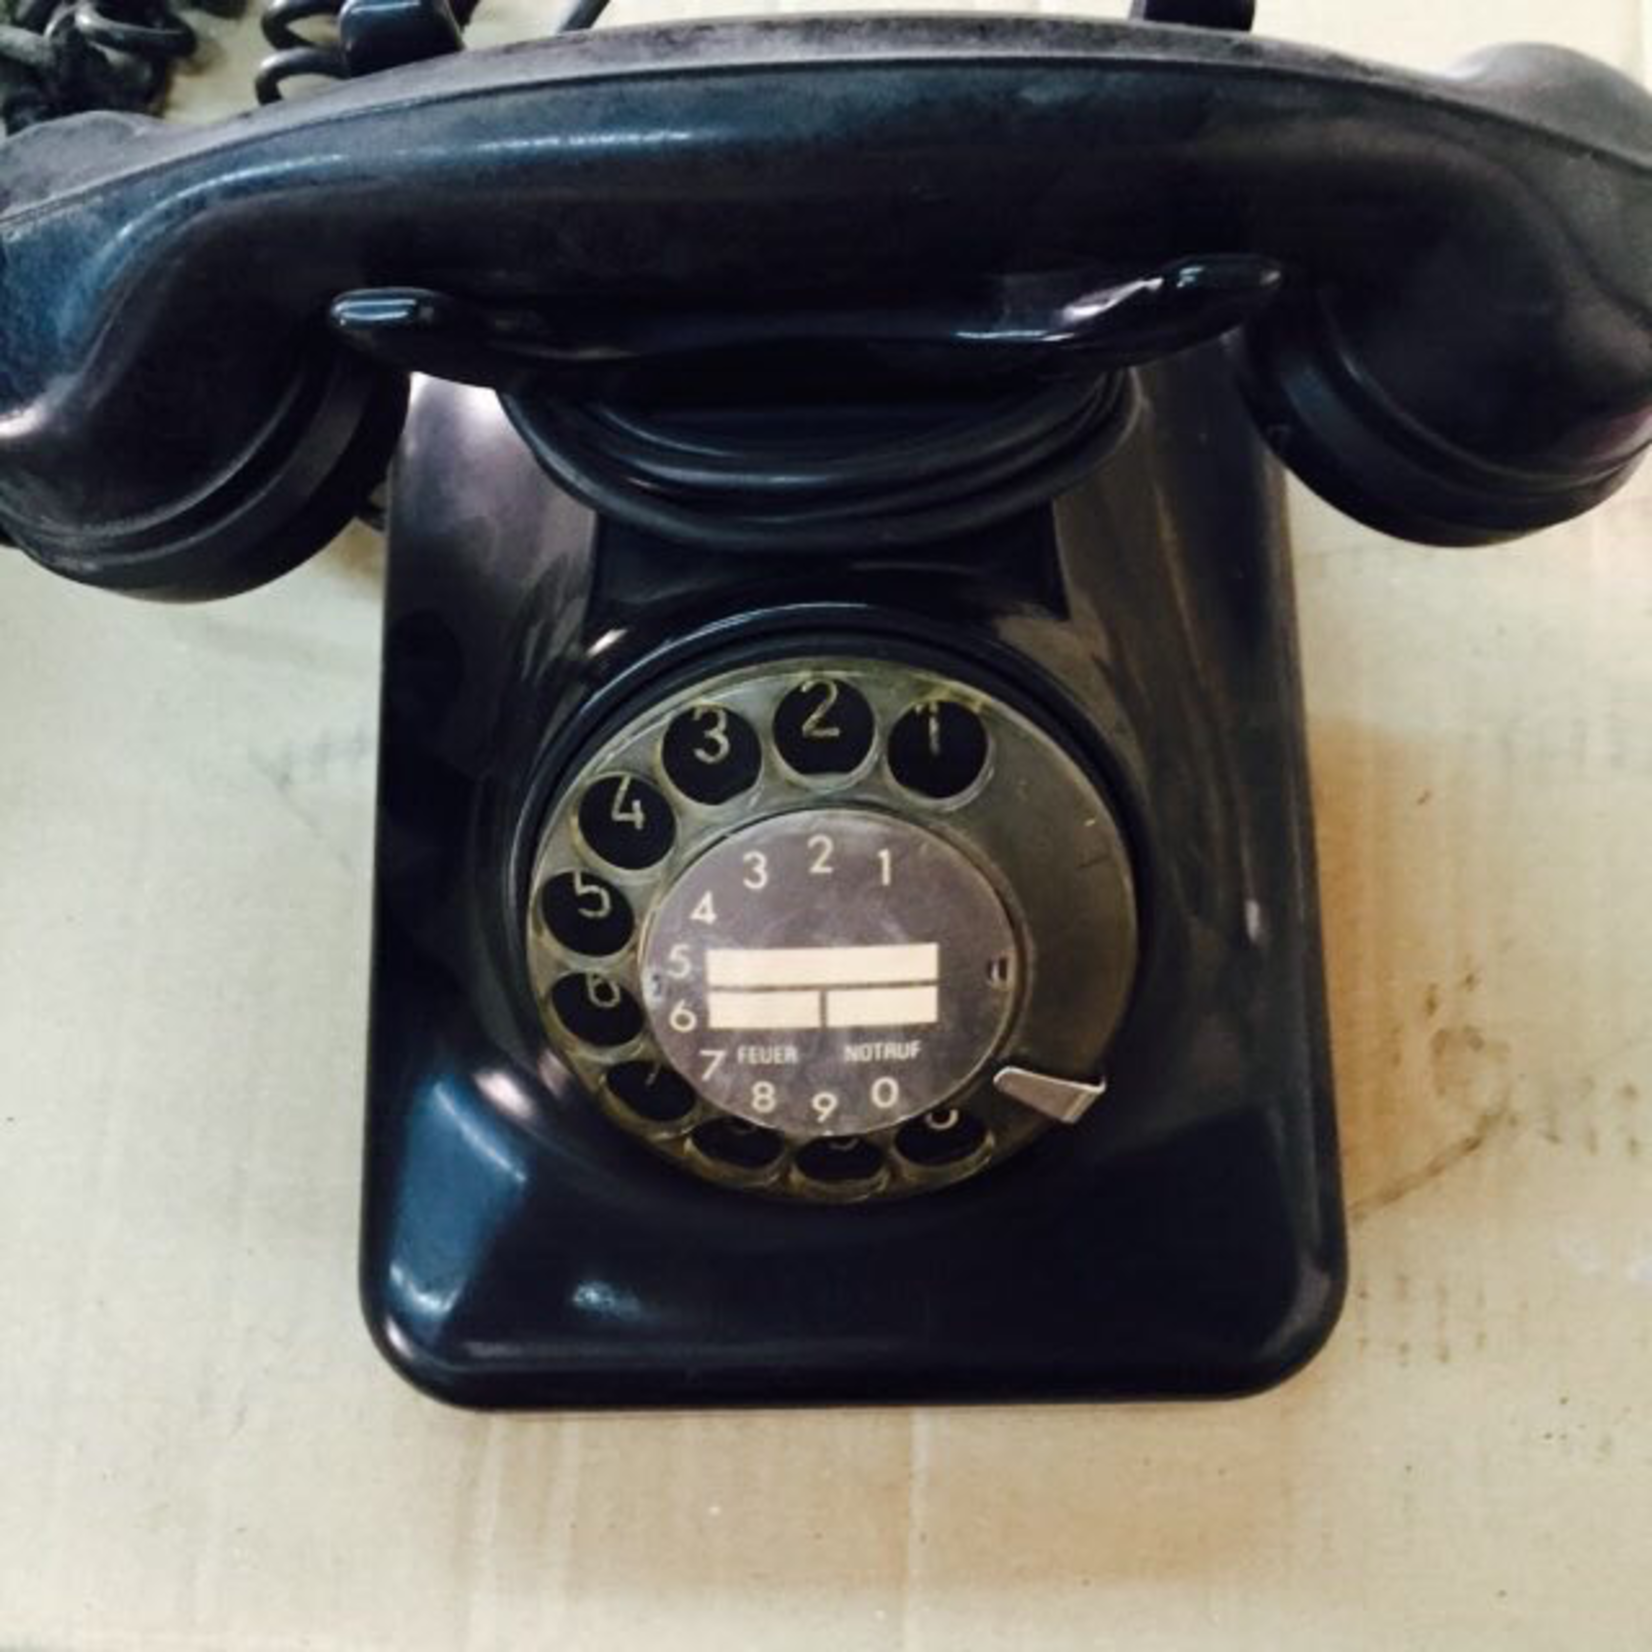 TAJHOME VINTAGE BALCK PHONE